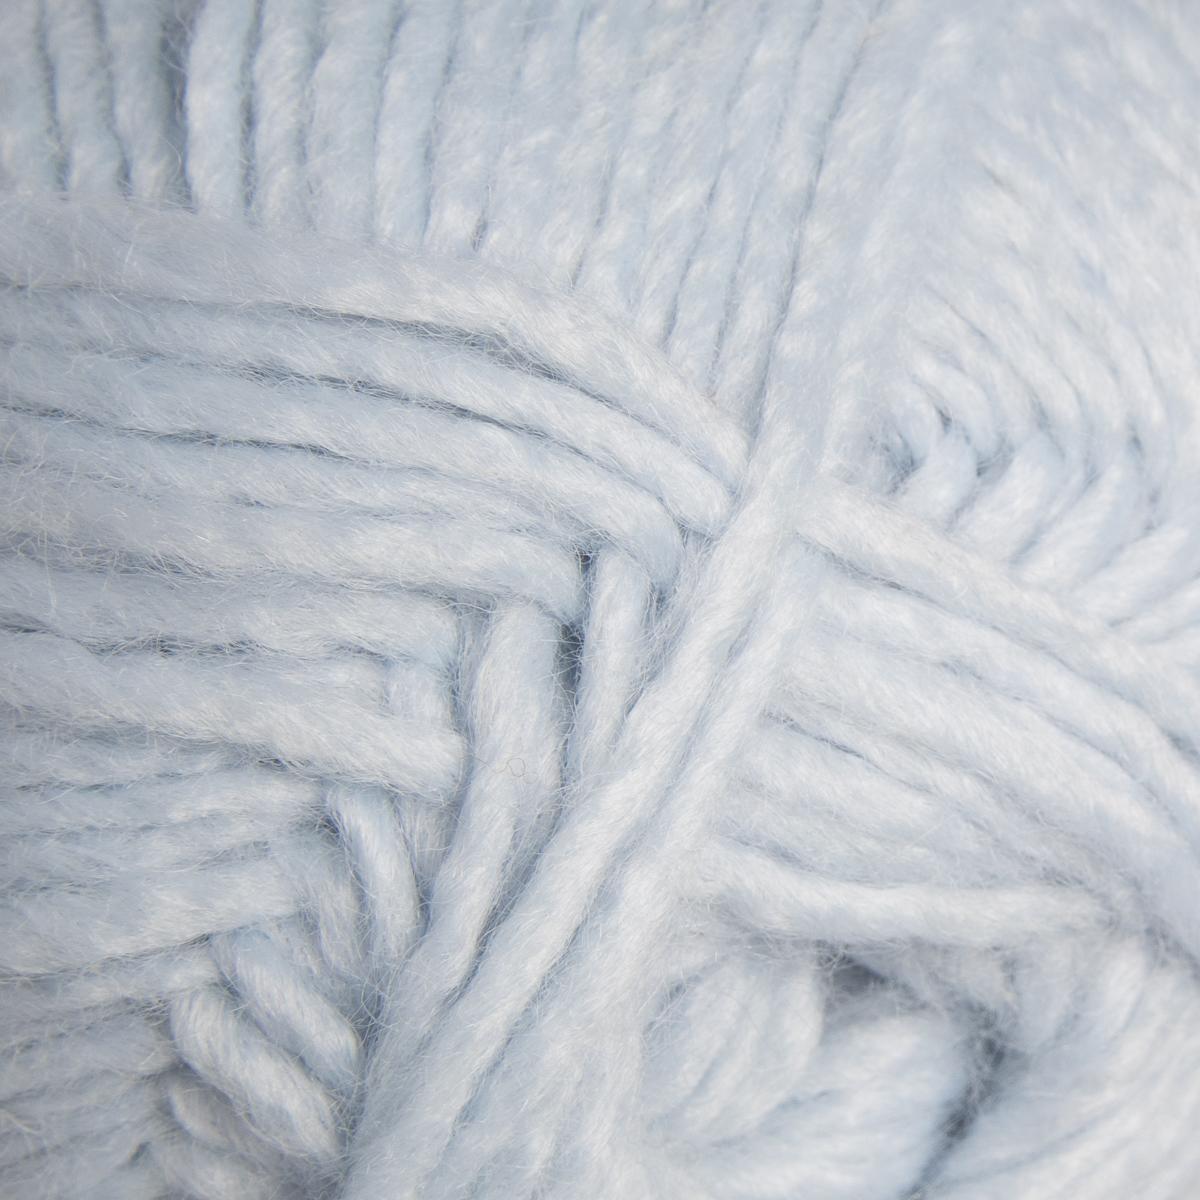 3pk-Lion-Brand-New-Basic-Acrylic-amp-Wool-Yarn-Medium-4-Knit-Crochet-Skeins-Soft thumbnail 55